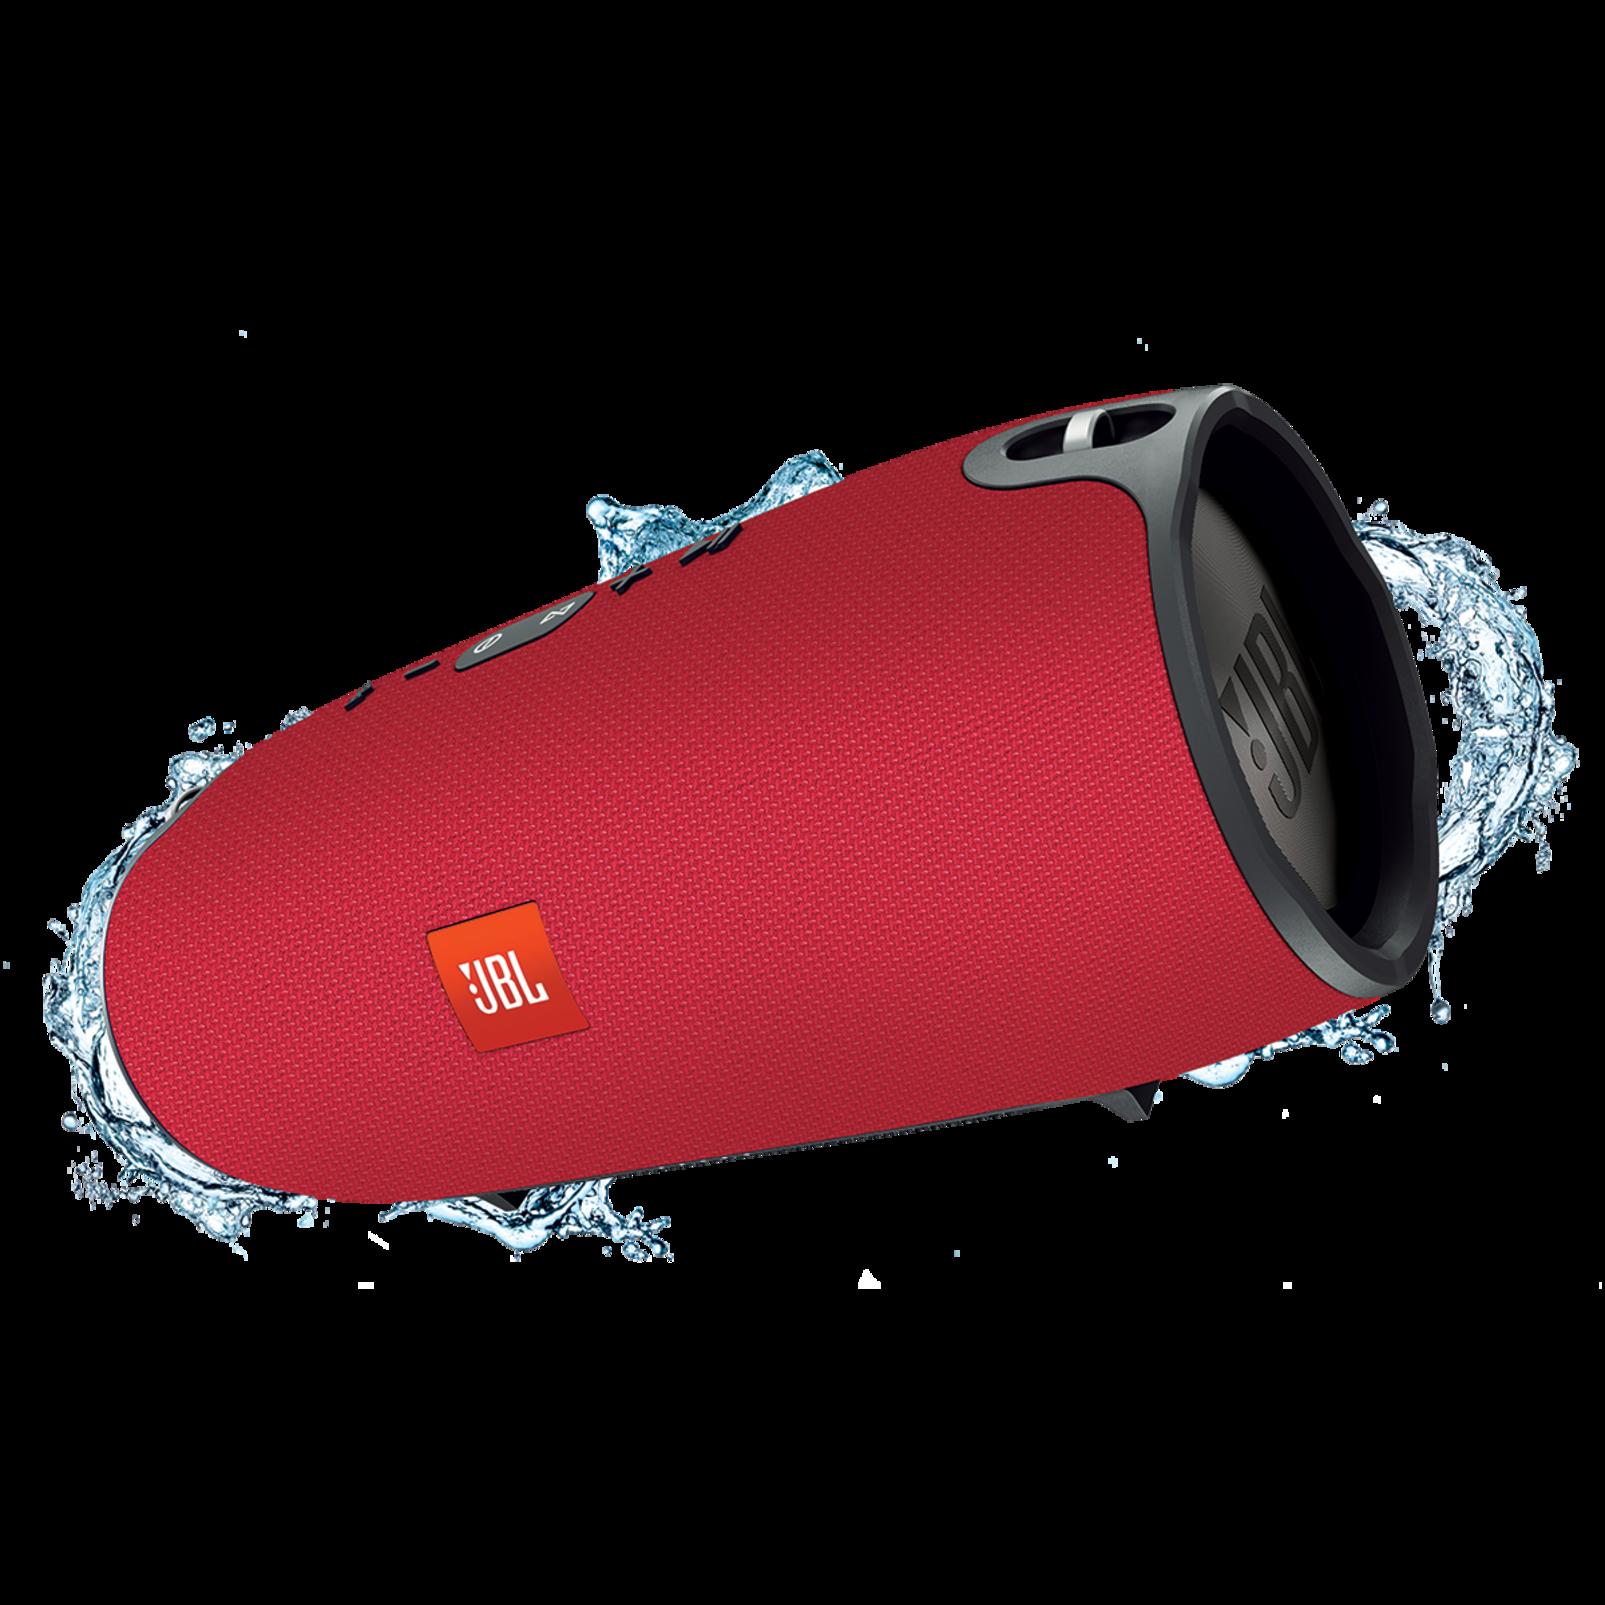 JBL Xtreme - Red - Splashproof portable speaker with ultra-powerful performance - Hero